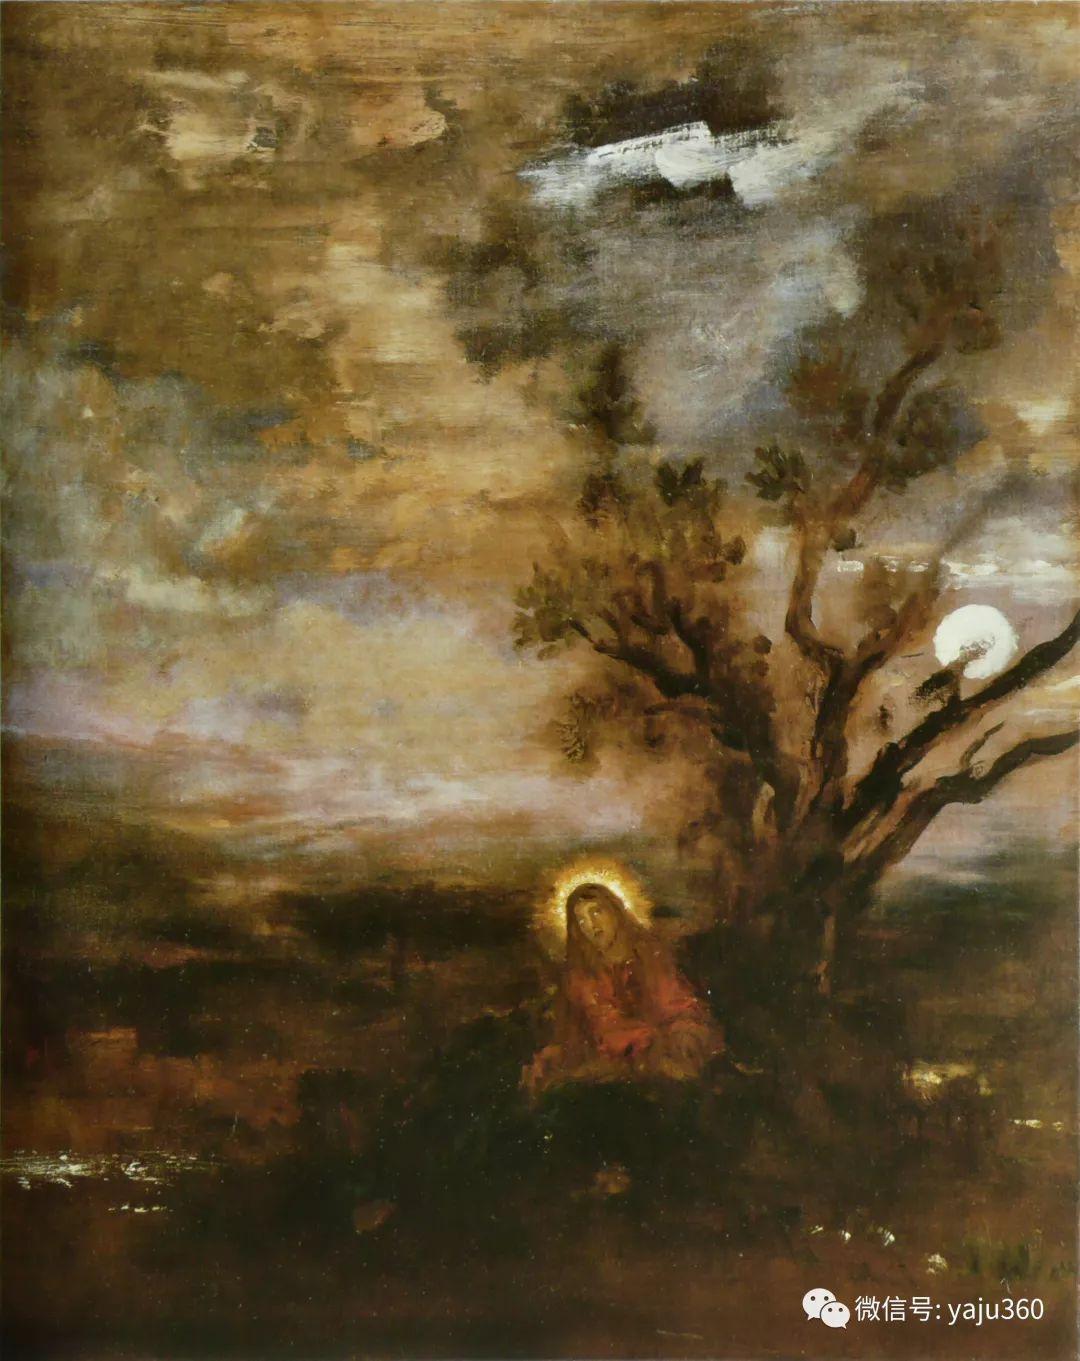 马蒂斯的师傅 法国Gustave Moreau插图89